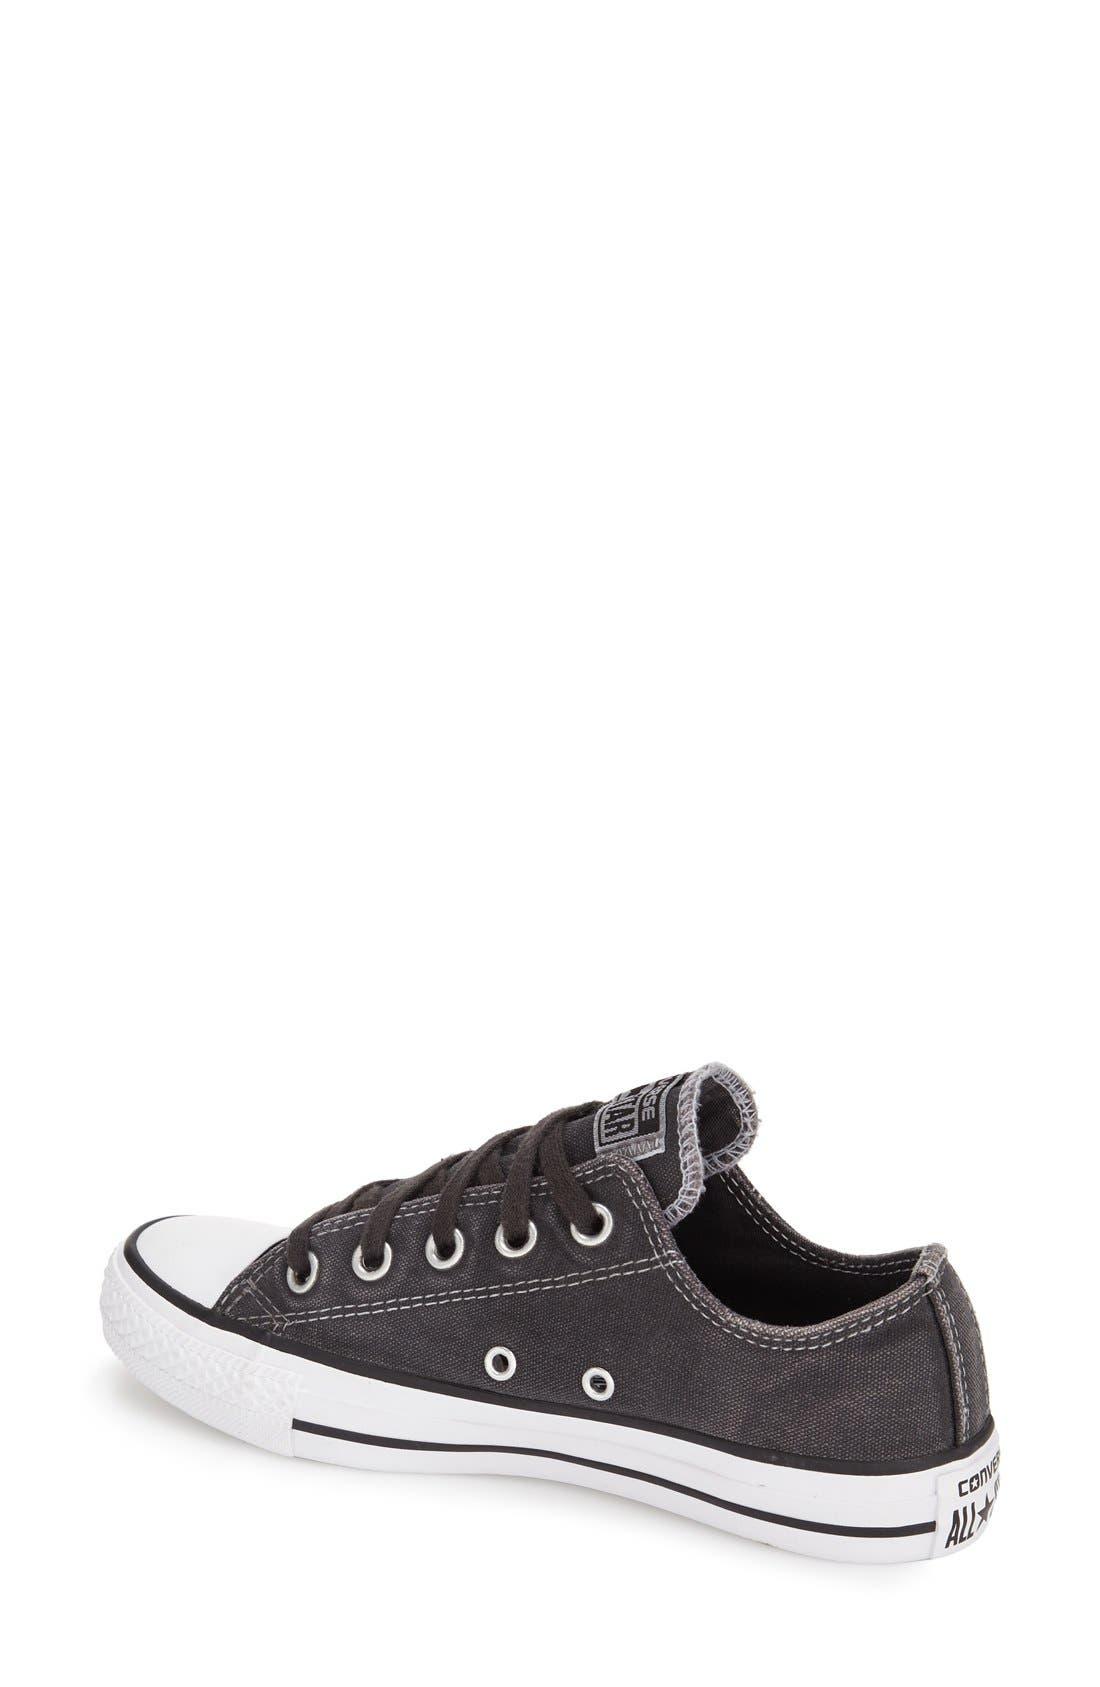 Alternate Image 2  - Converse Chuck Taylor® All Star® Low Top Sneaker (Women)